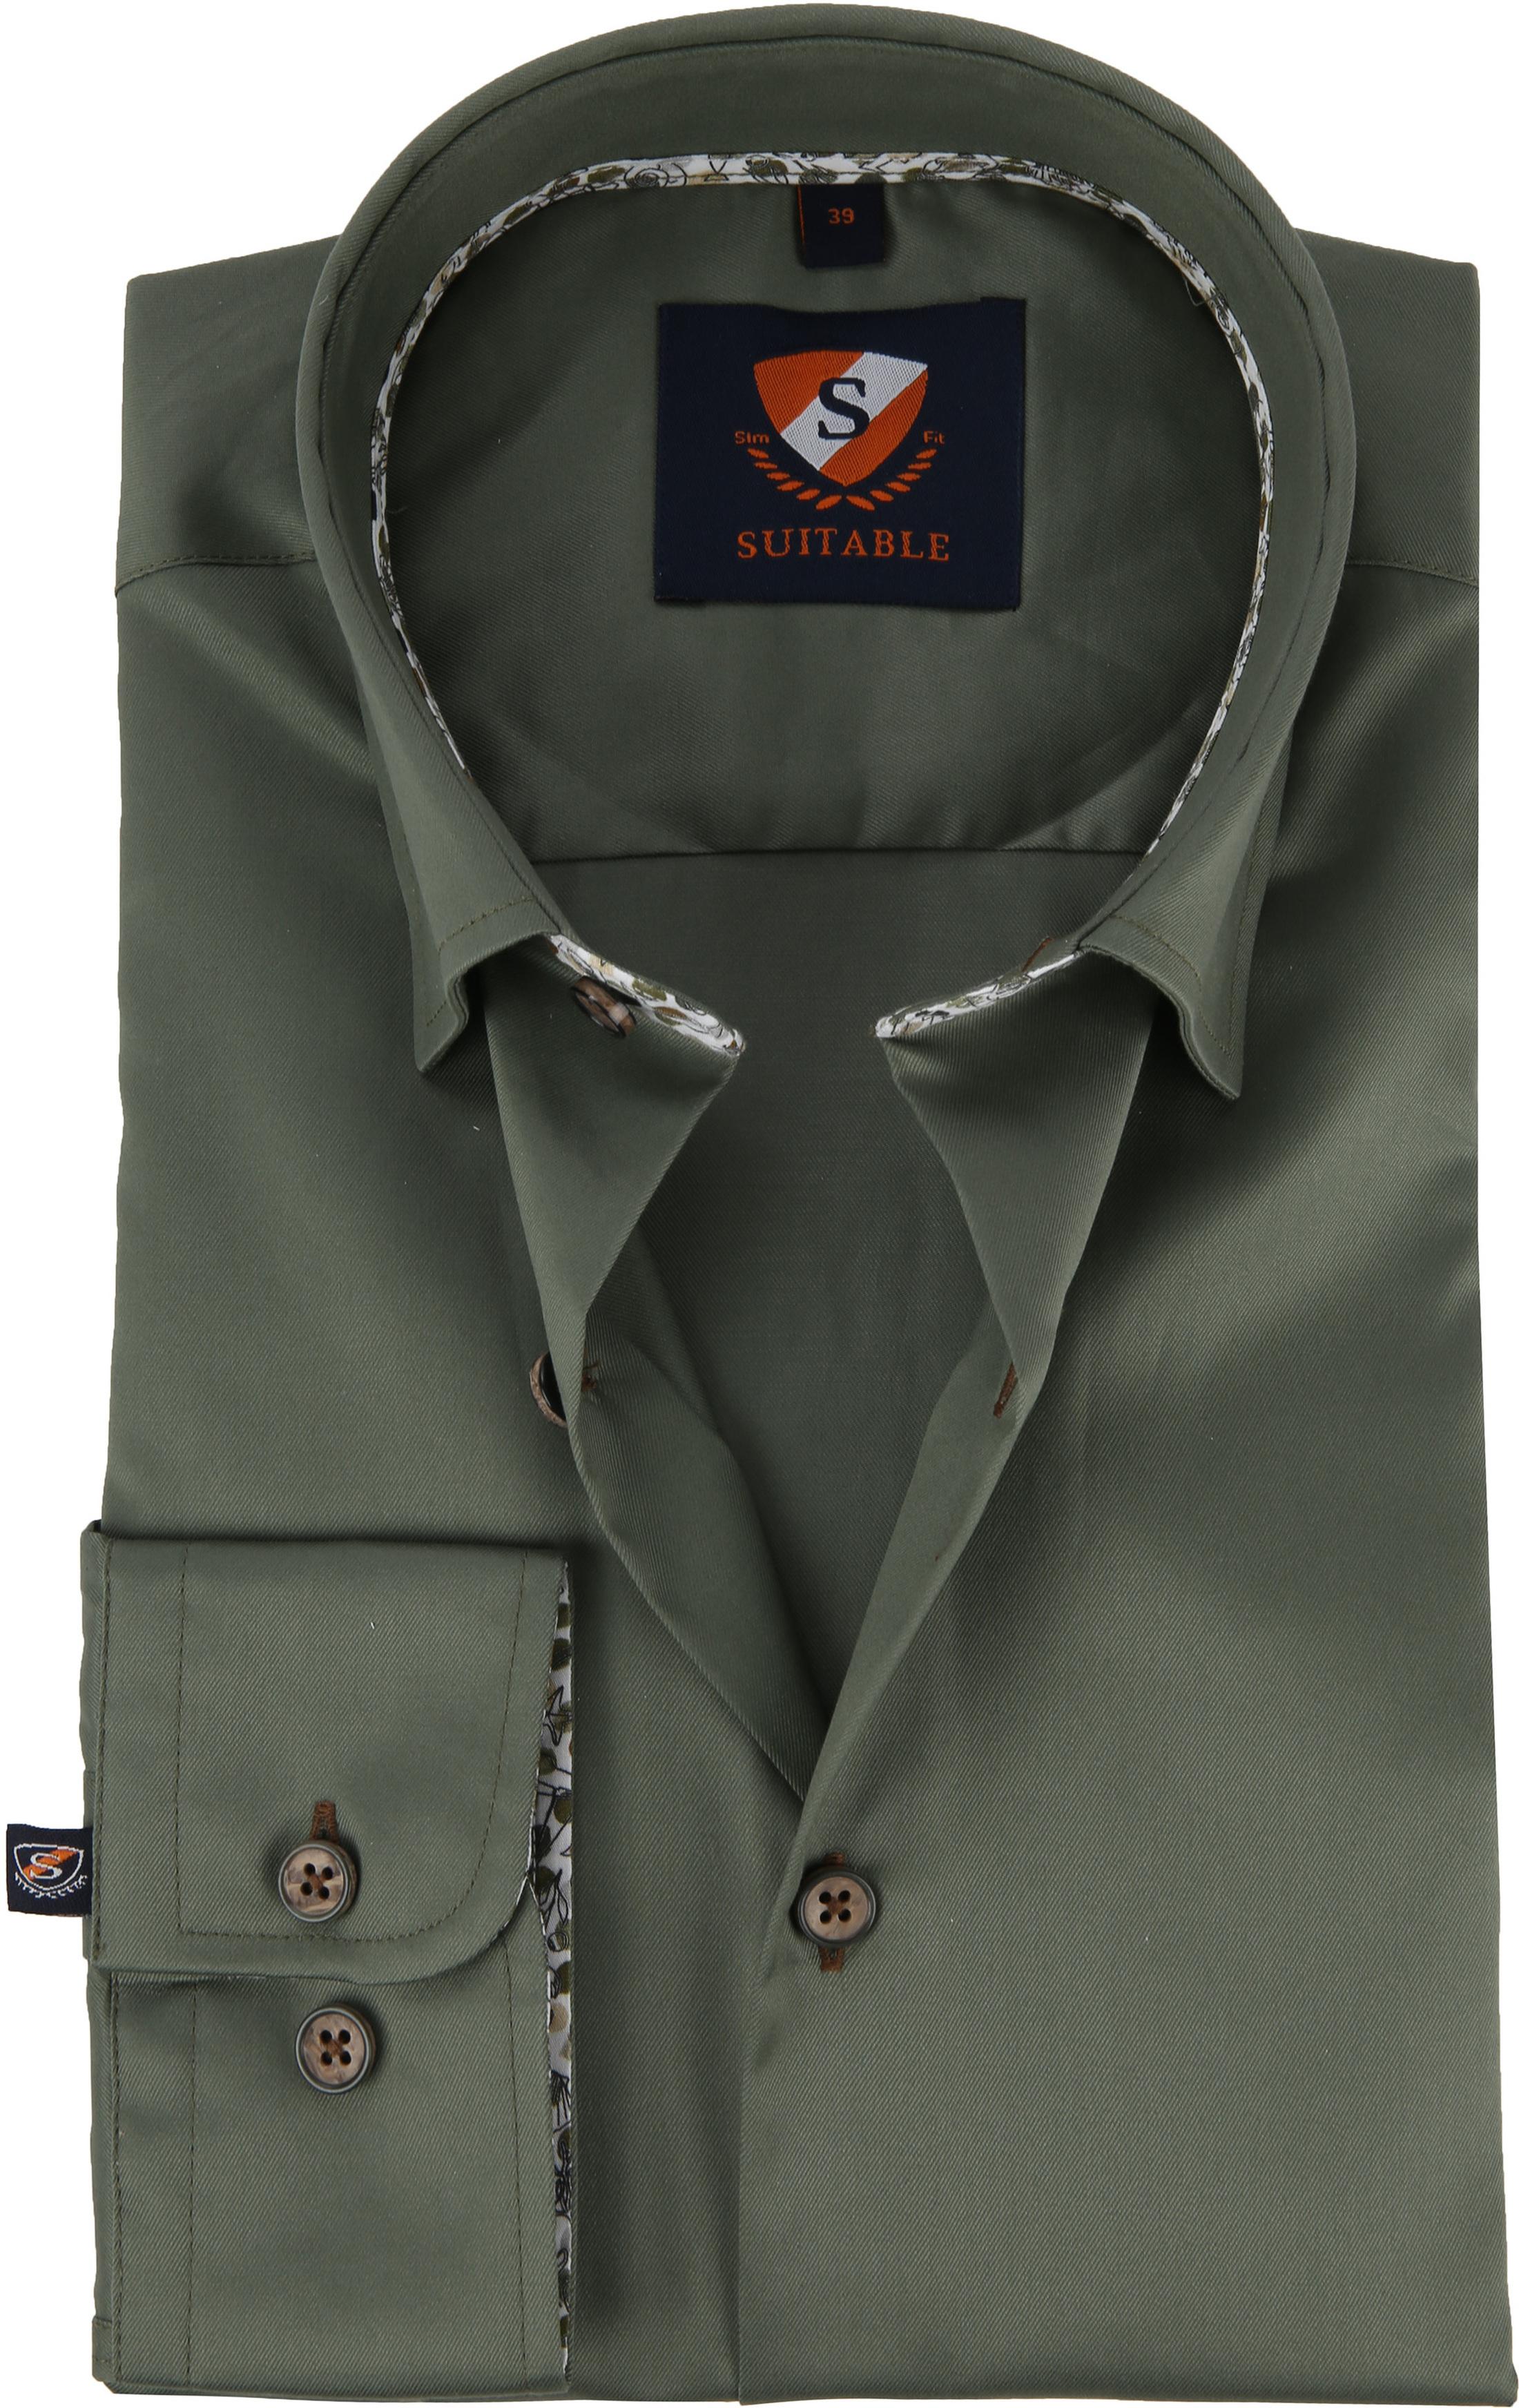 c86e792238f aflossingsvrije hypotheek opnieuw afsluiten Suitable Overhemd HBD Royal  Army foto 0